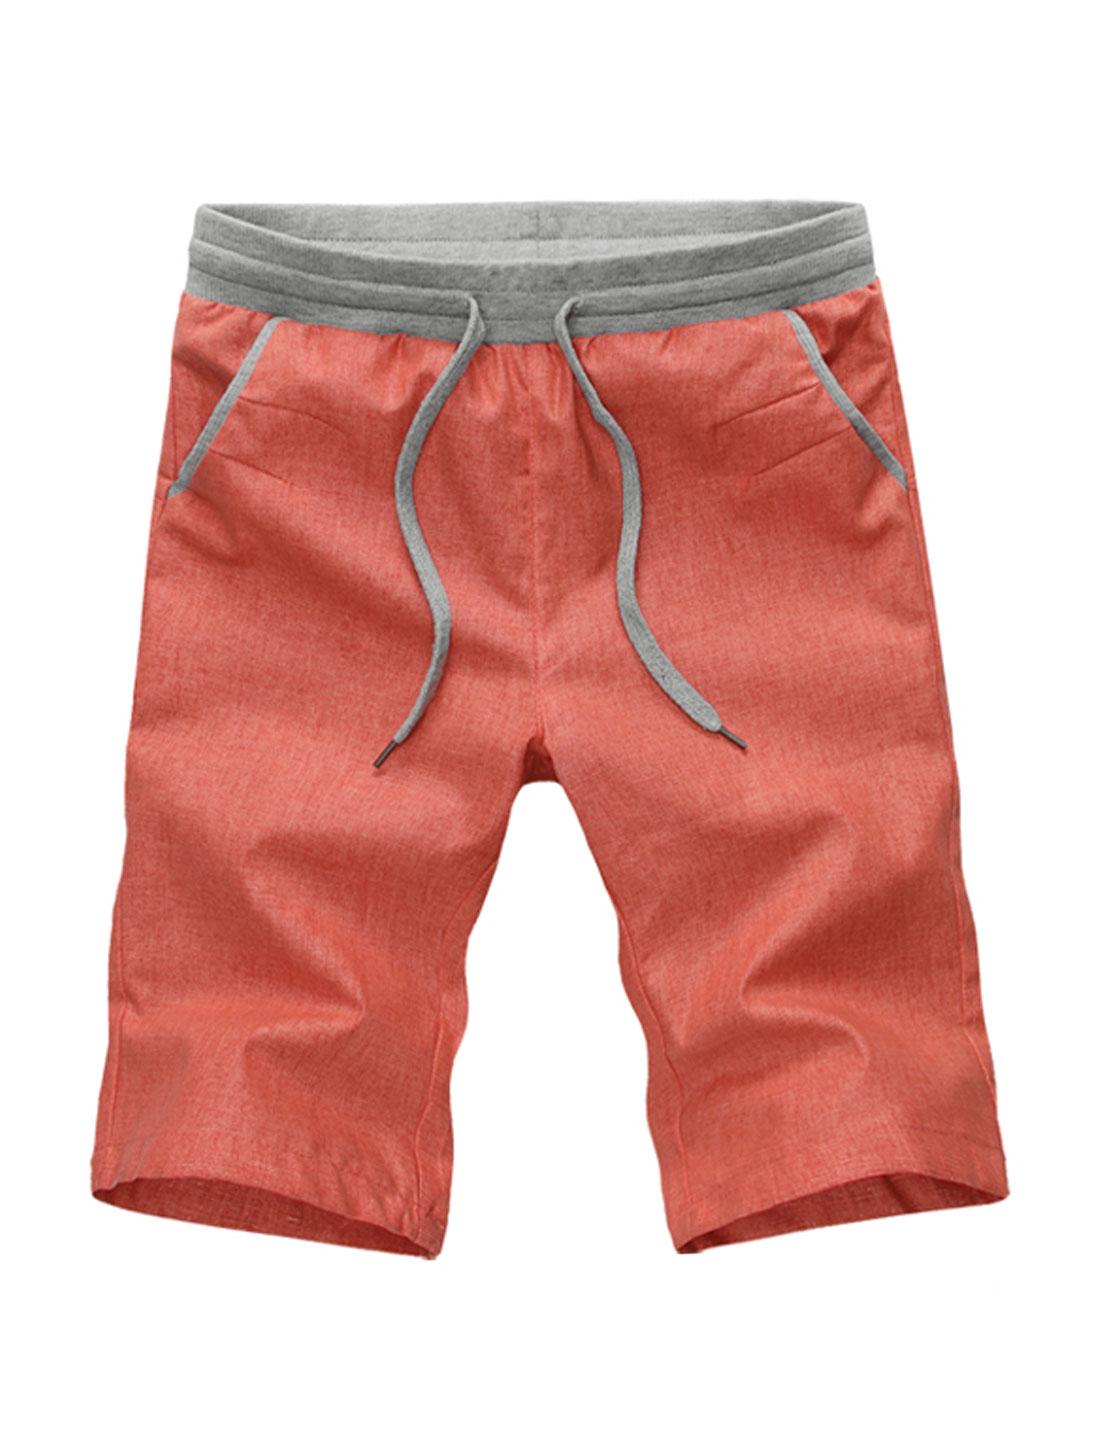 Men Mid Rise Straight Leg Panel Detail Linen Casual Shorts Orange Red W30